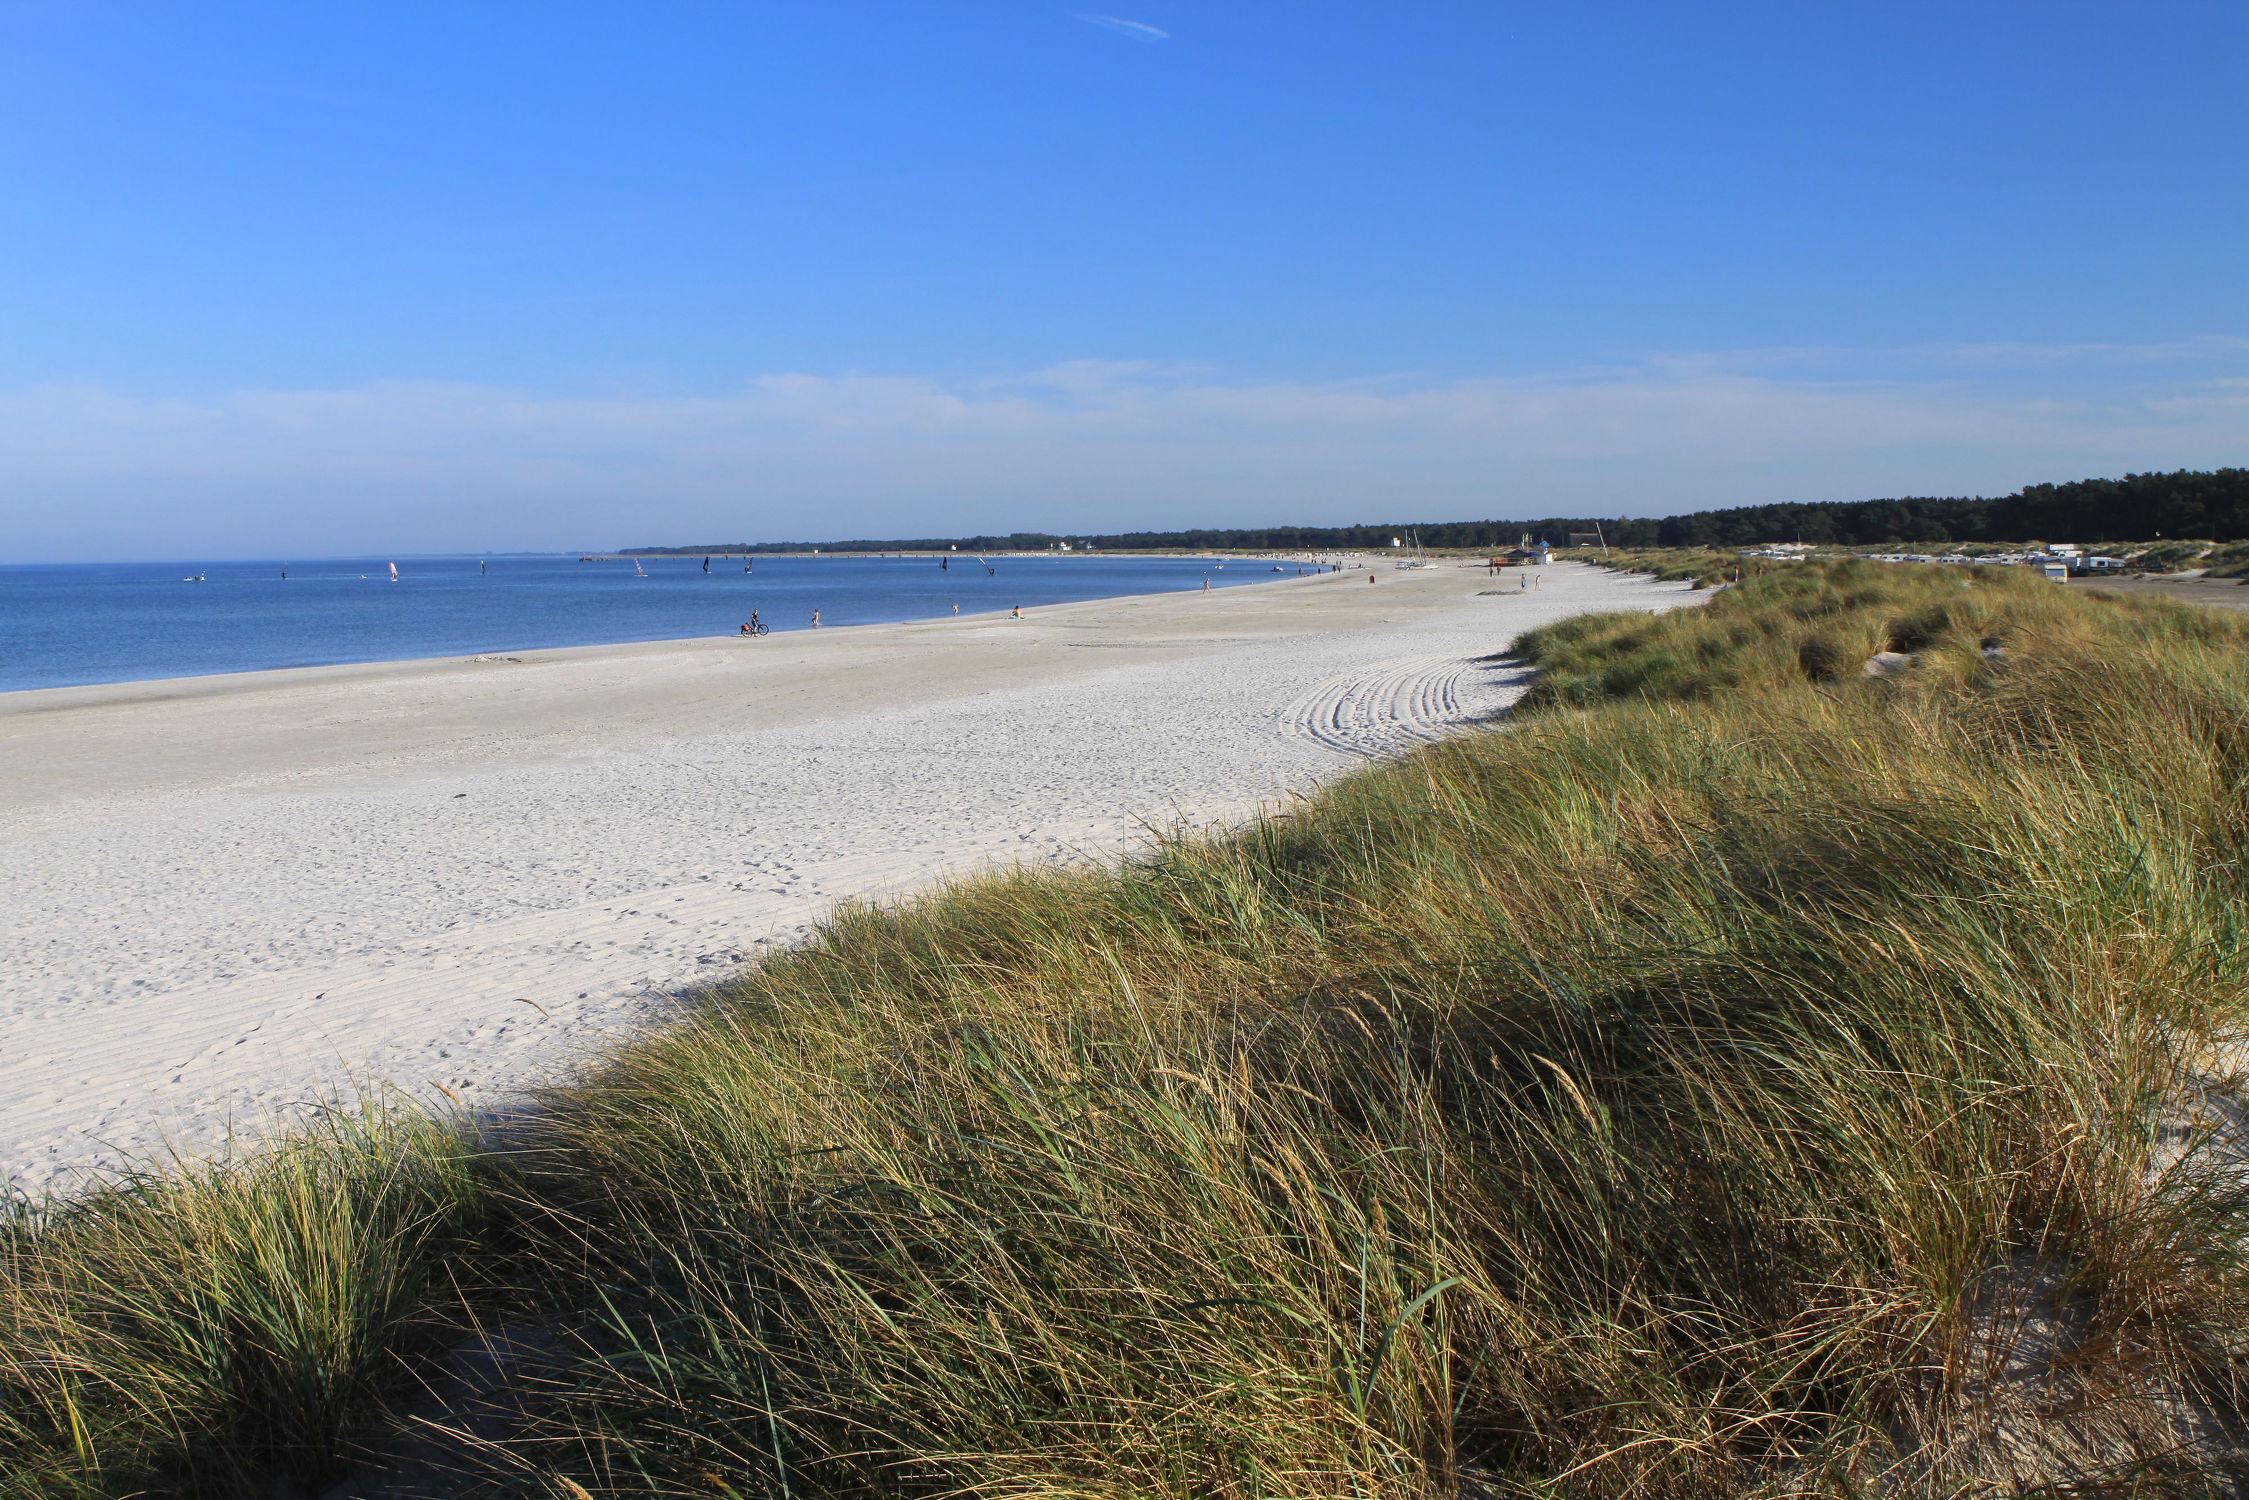 Bild mit Sand, Strand, Sandstrand, Ostsee, Düne, Dünen, See, Am Strand, Strandhafer